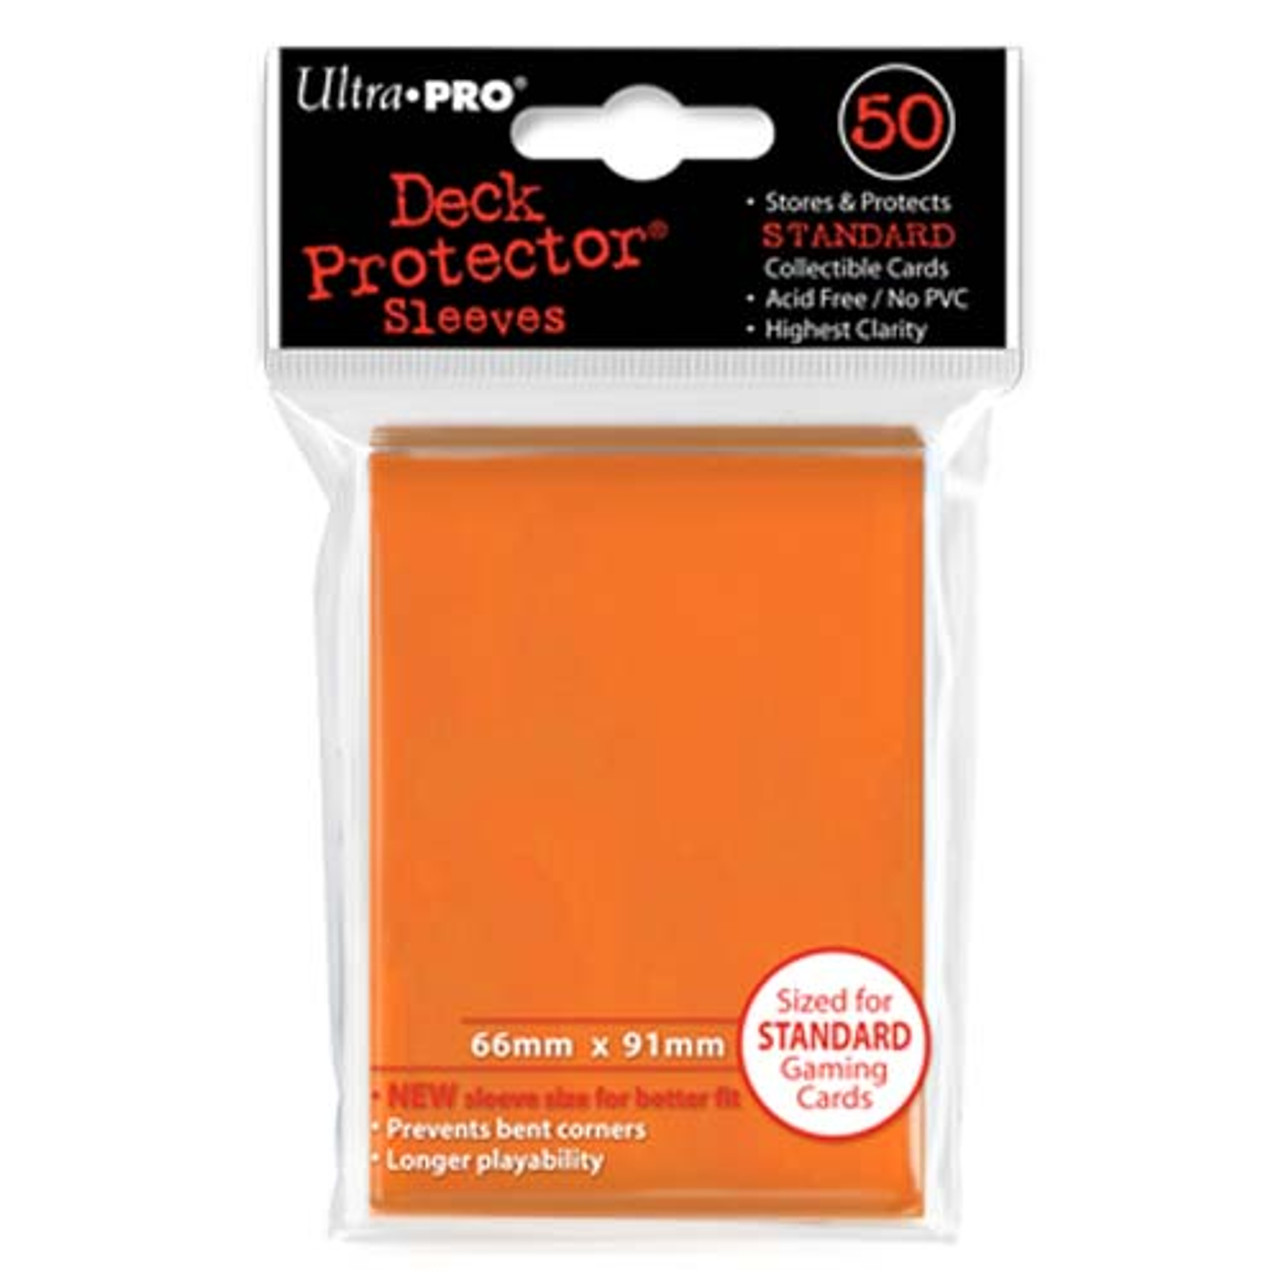 Deck Protectors - Solid - Orange (One Pack of 50)